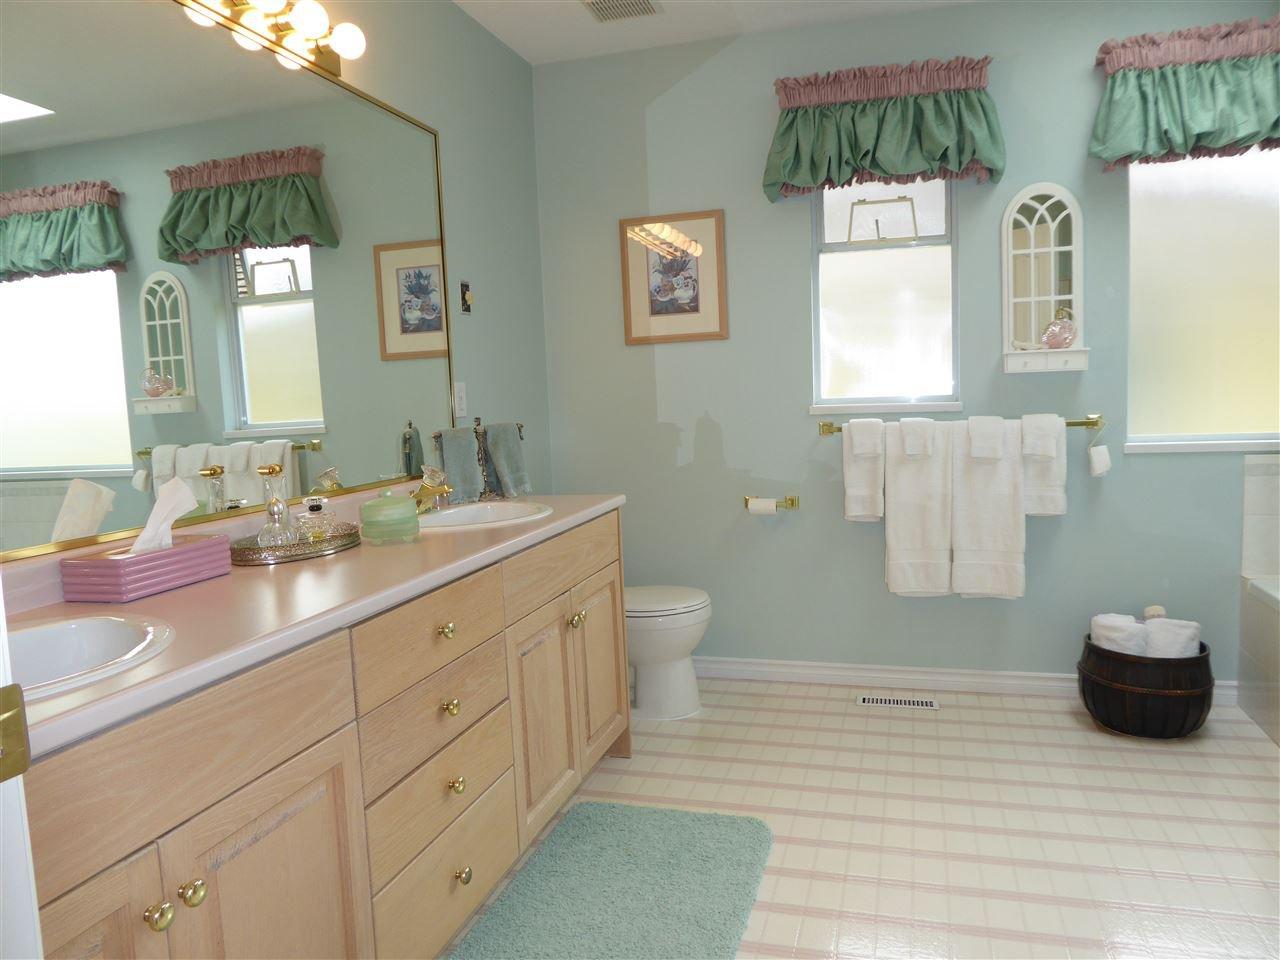 Photo 13: Photos: 1252 DEWAR Way in Port Coquitlam: Citadel PQ House for sale : MLS®# R2199639